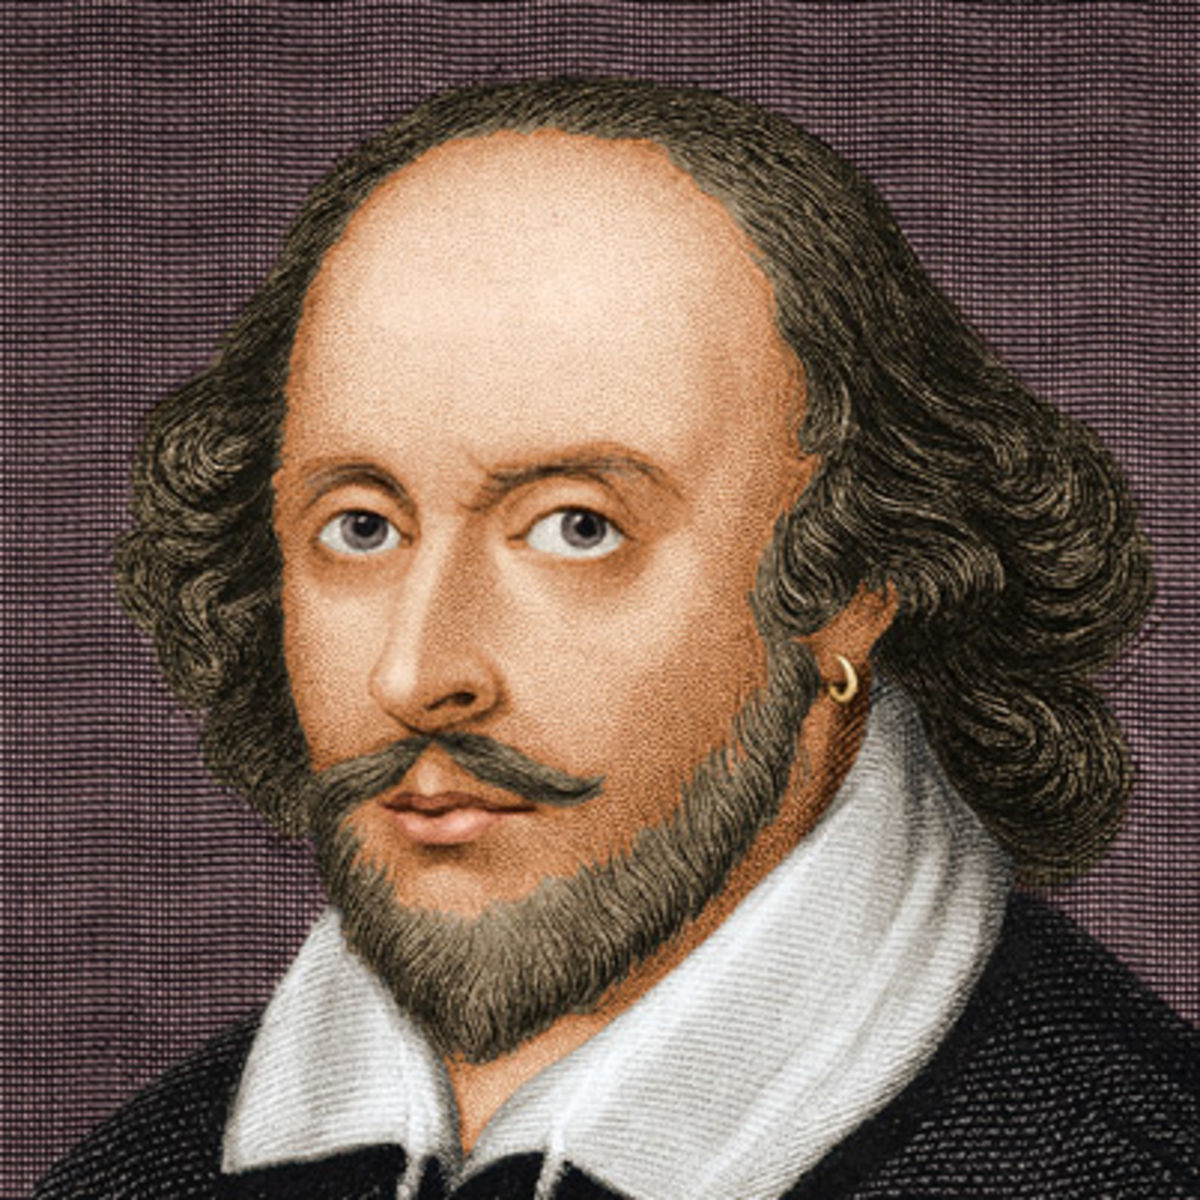 Shakespeare on emaze